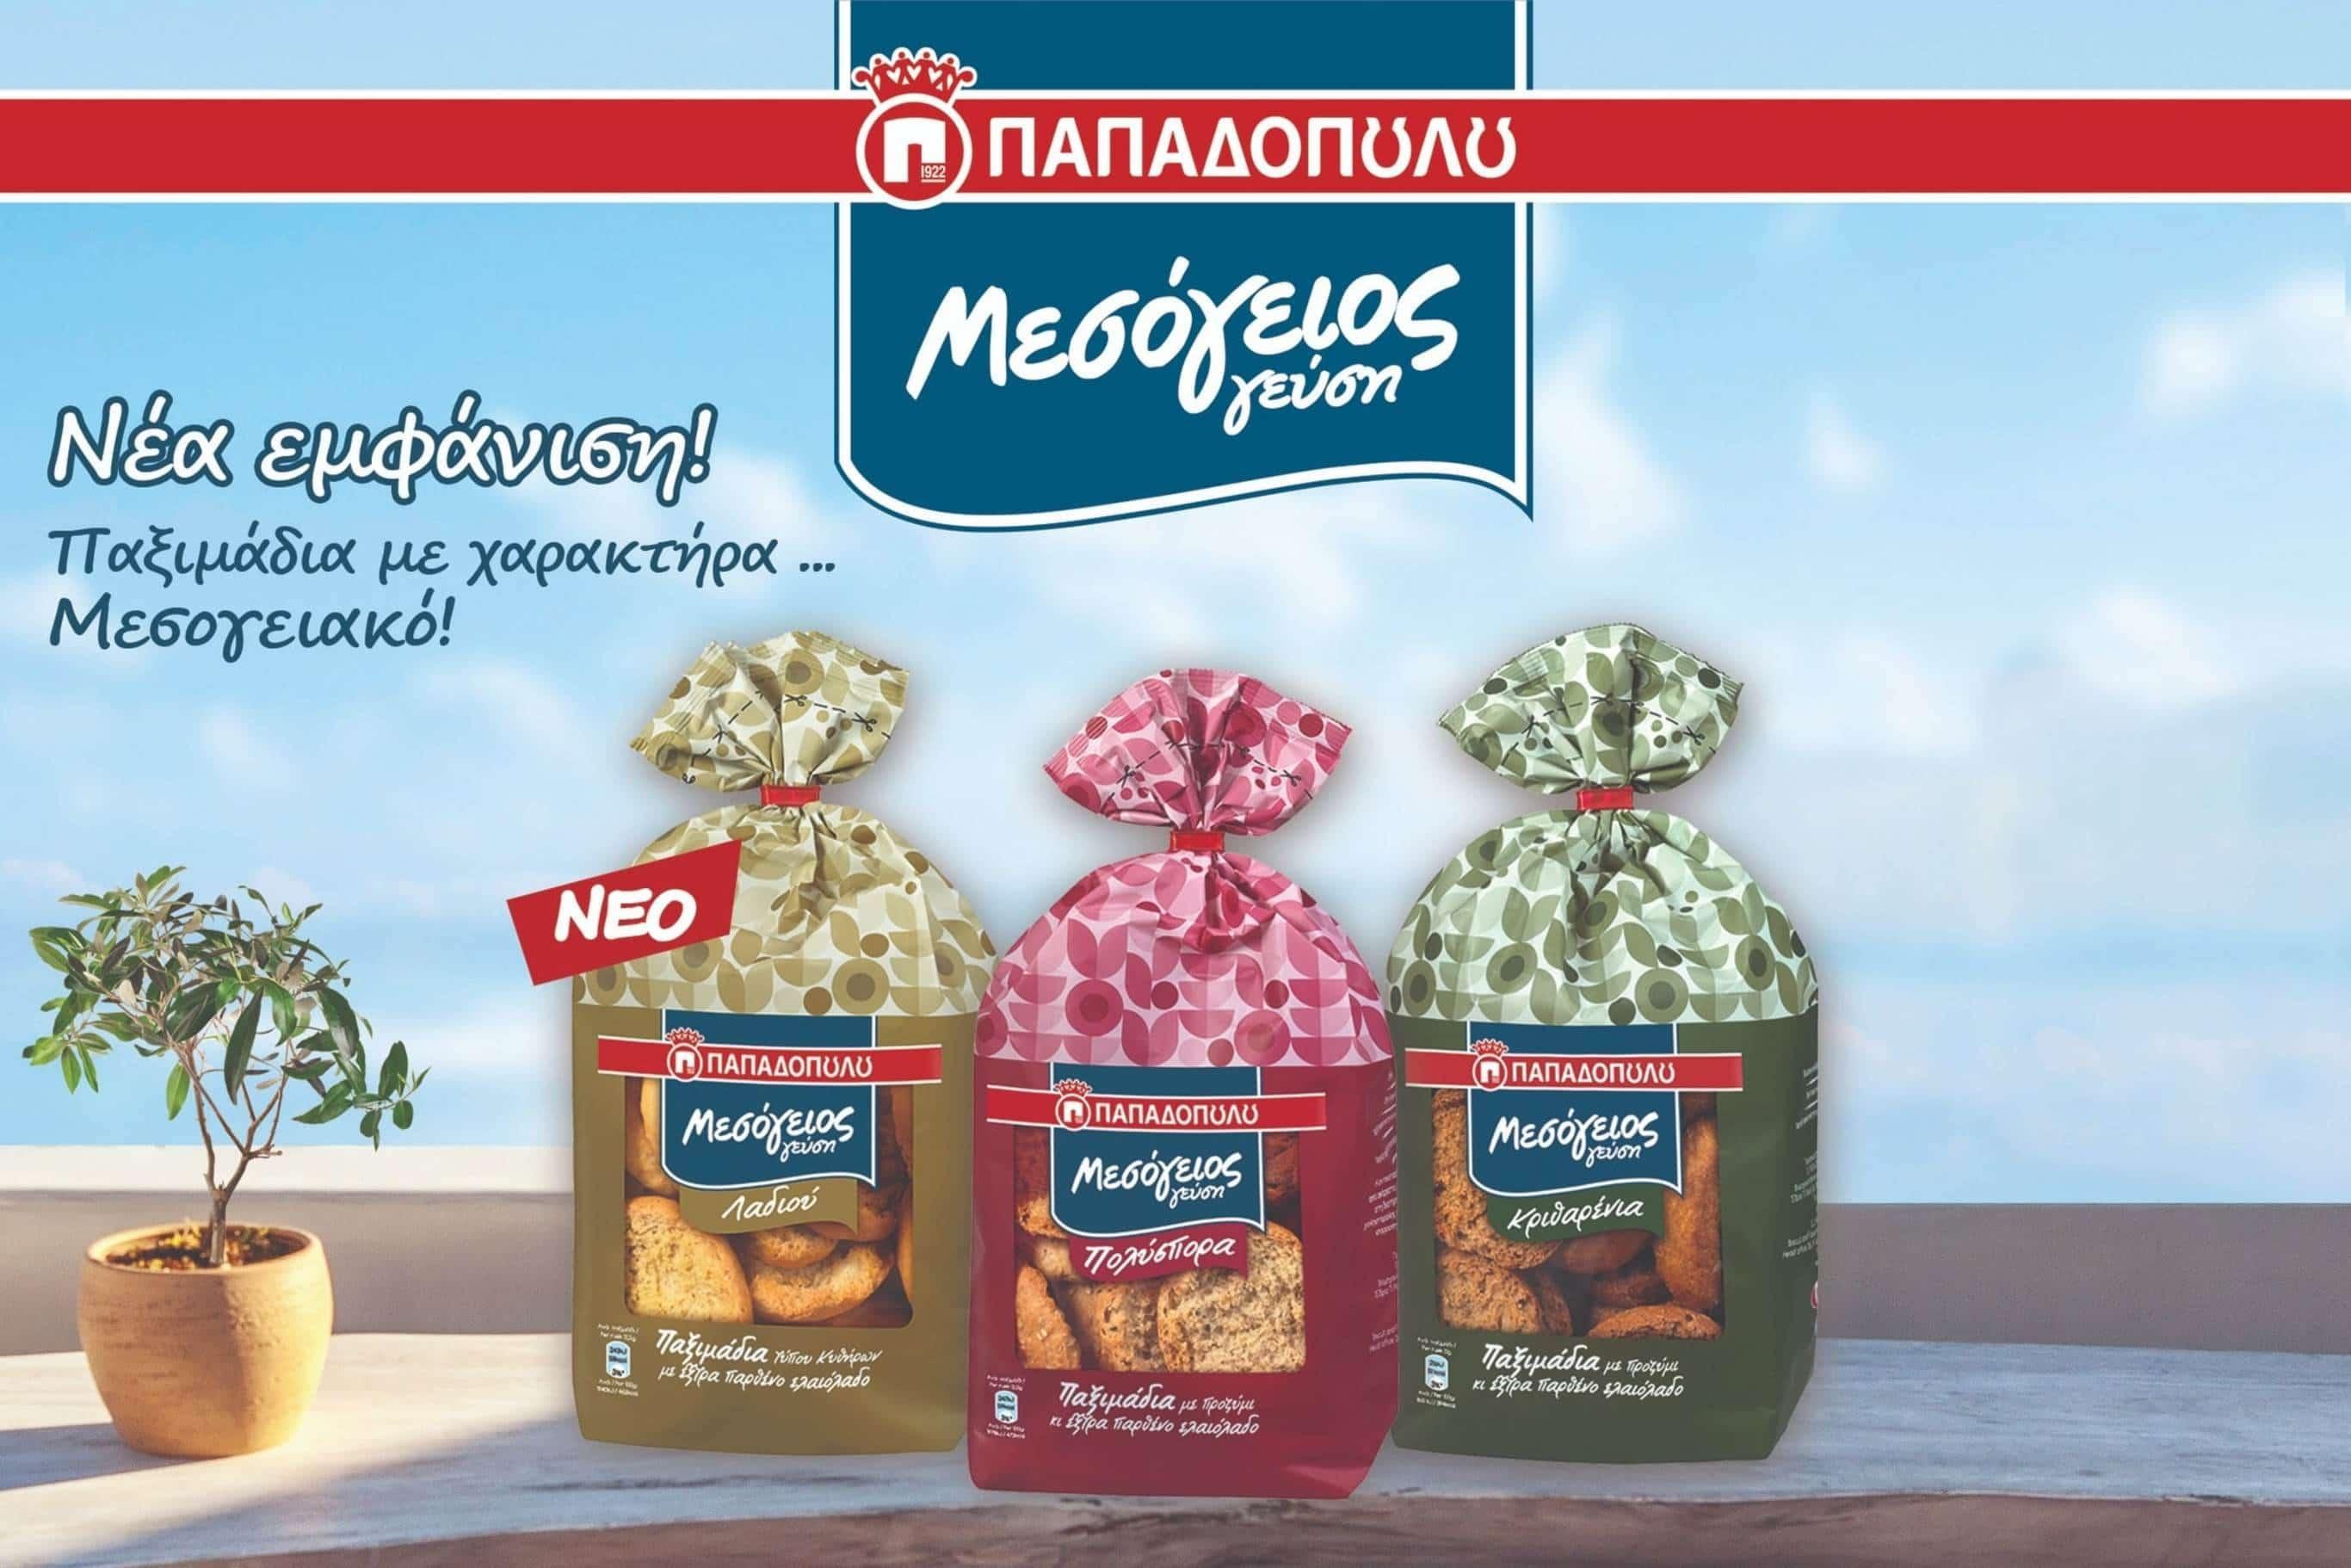 Featured image for Τα παξιμάδια «Μεσόγειος γεύση ΠΑΠΑΔΟΠΟΥΛΟΥ» με νέα εμφάνιση και υψηλή διατροφική αξία!